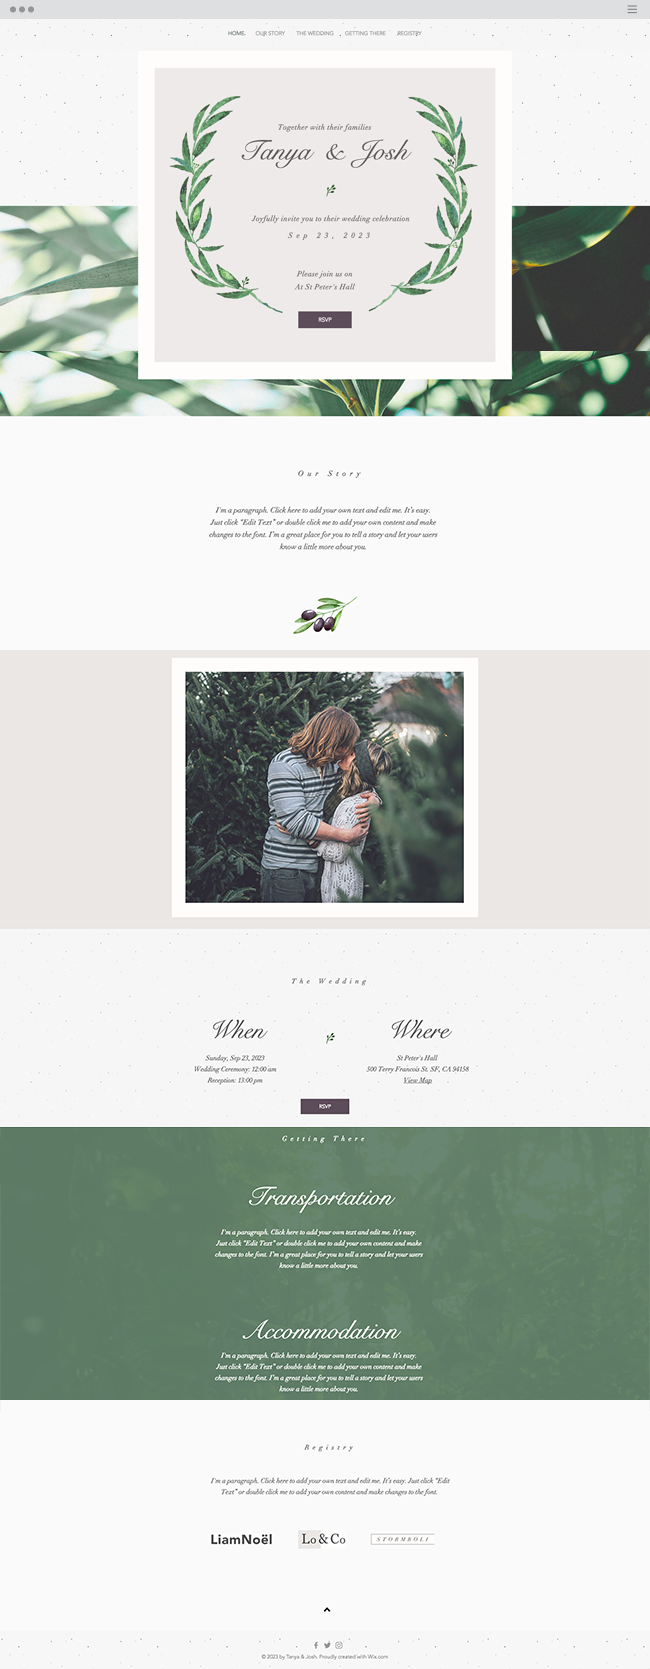 Elegant Wedding Invitation | Online Invitation Template | Wix ...